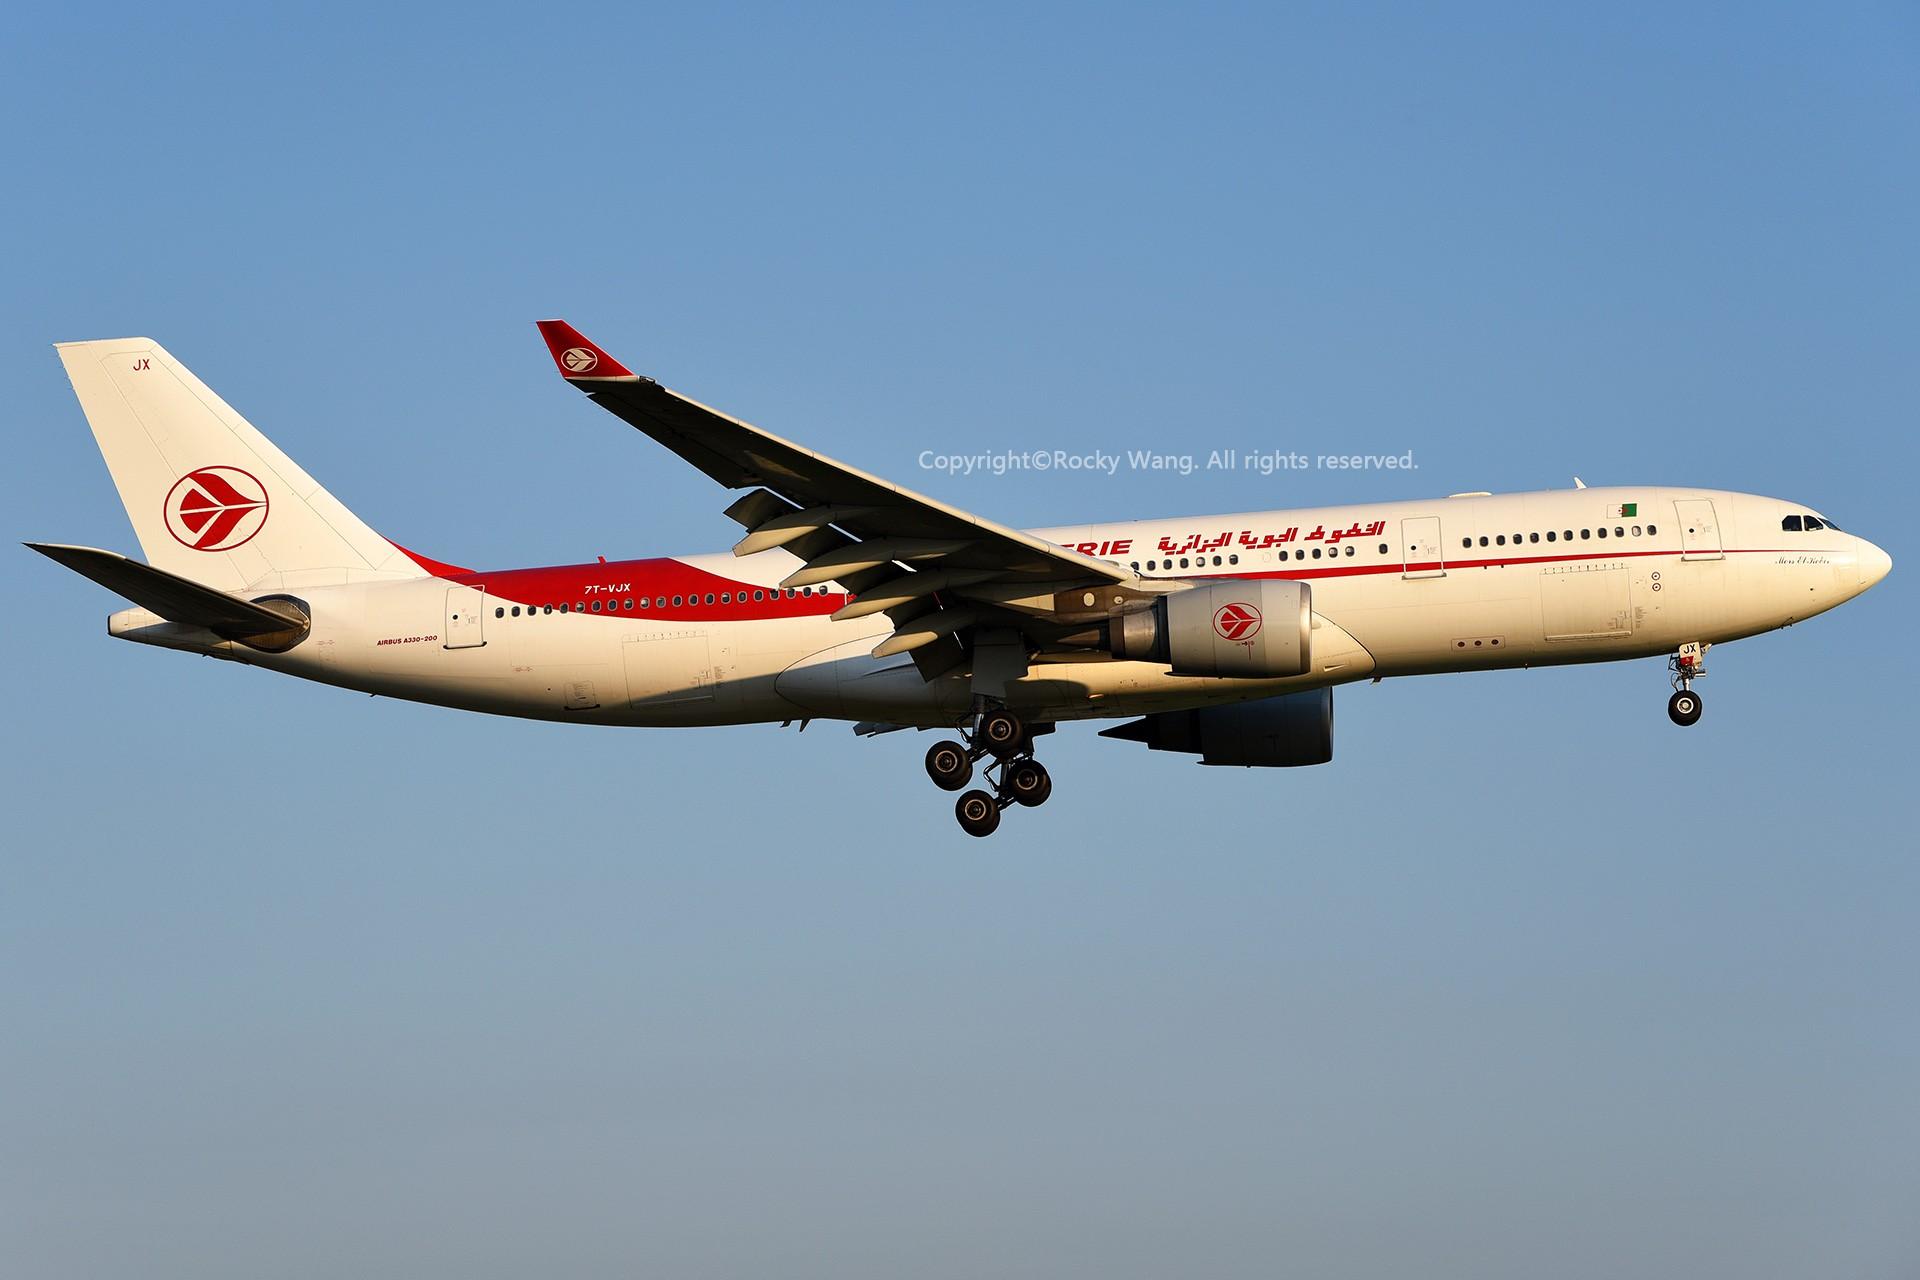 Re:[原创]A330s Around the World AIRBUS A330-202 7T-VJX 加拿大蒙特利尔特鲁多机场